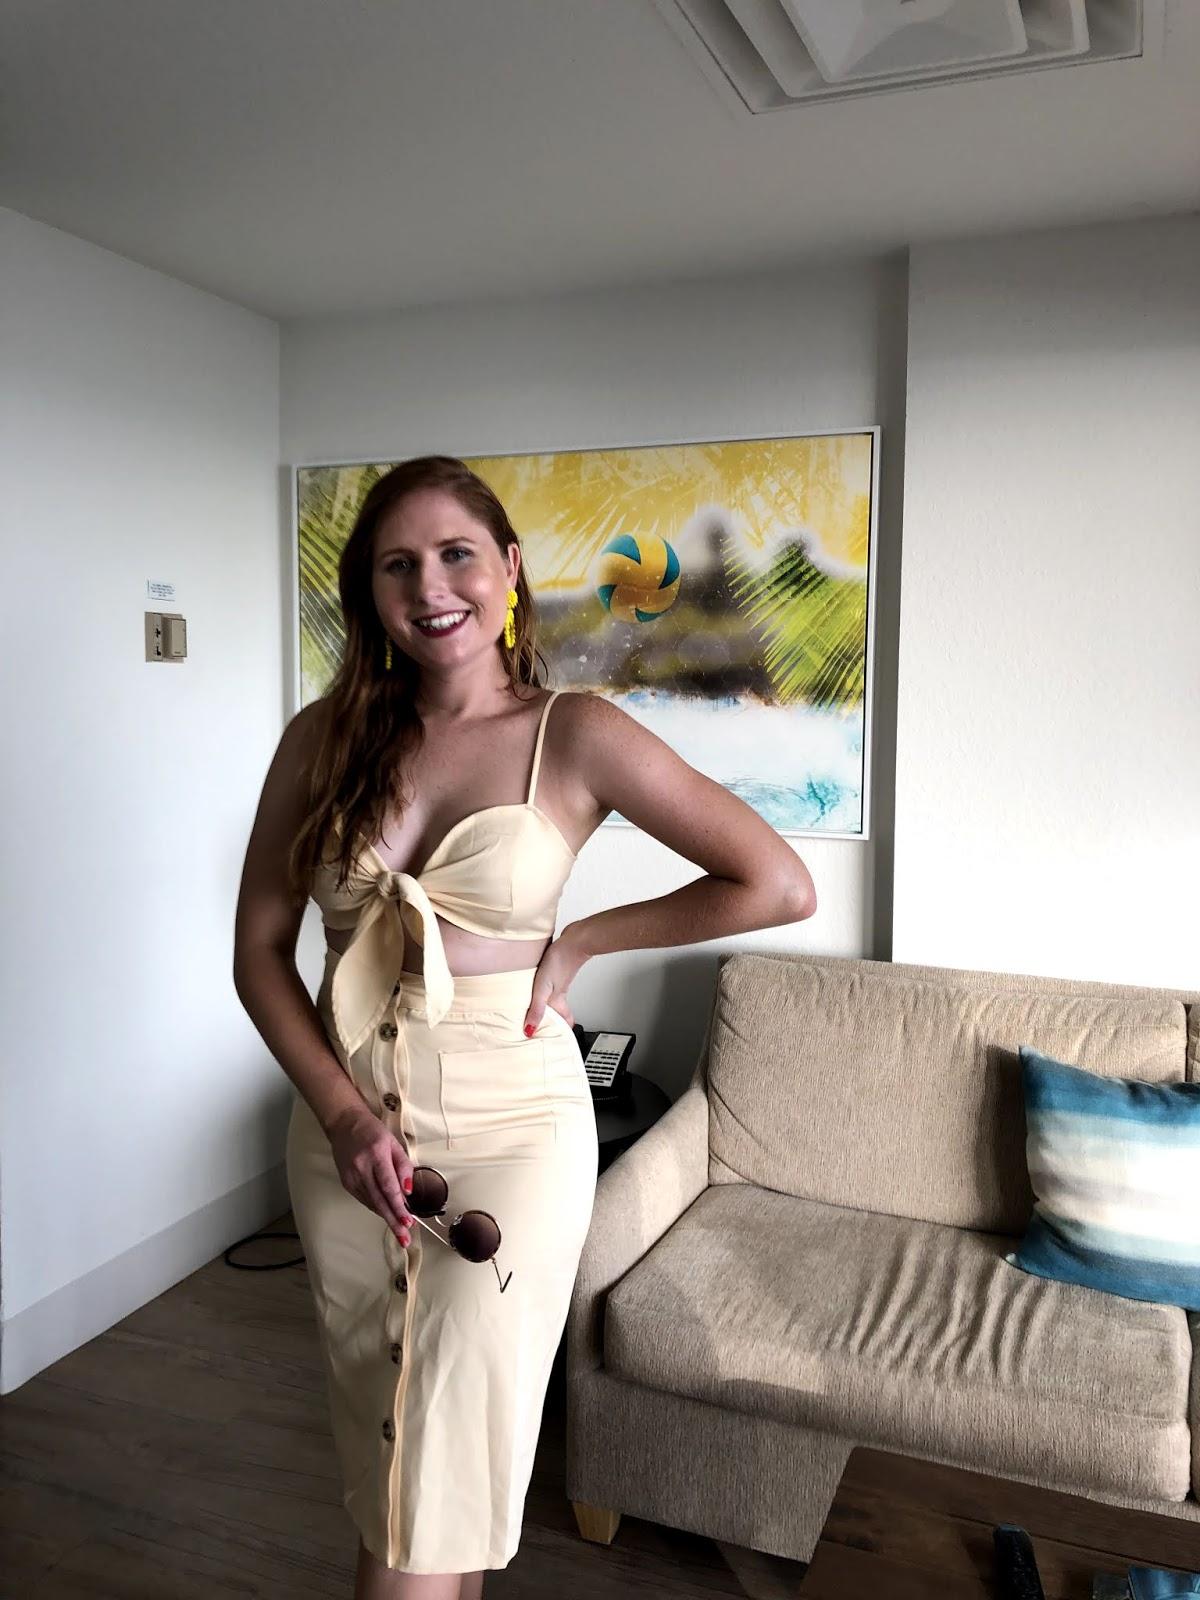 Amazon TOP-MAX Women's Dresses-Summer Spaghetti Strap Sleeveless Cocktail Party Casual Button Down Midi Dress Blue Black Stripe